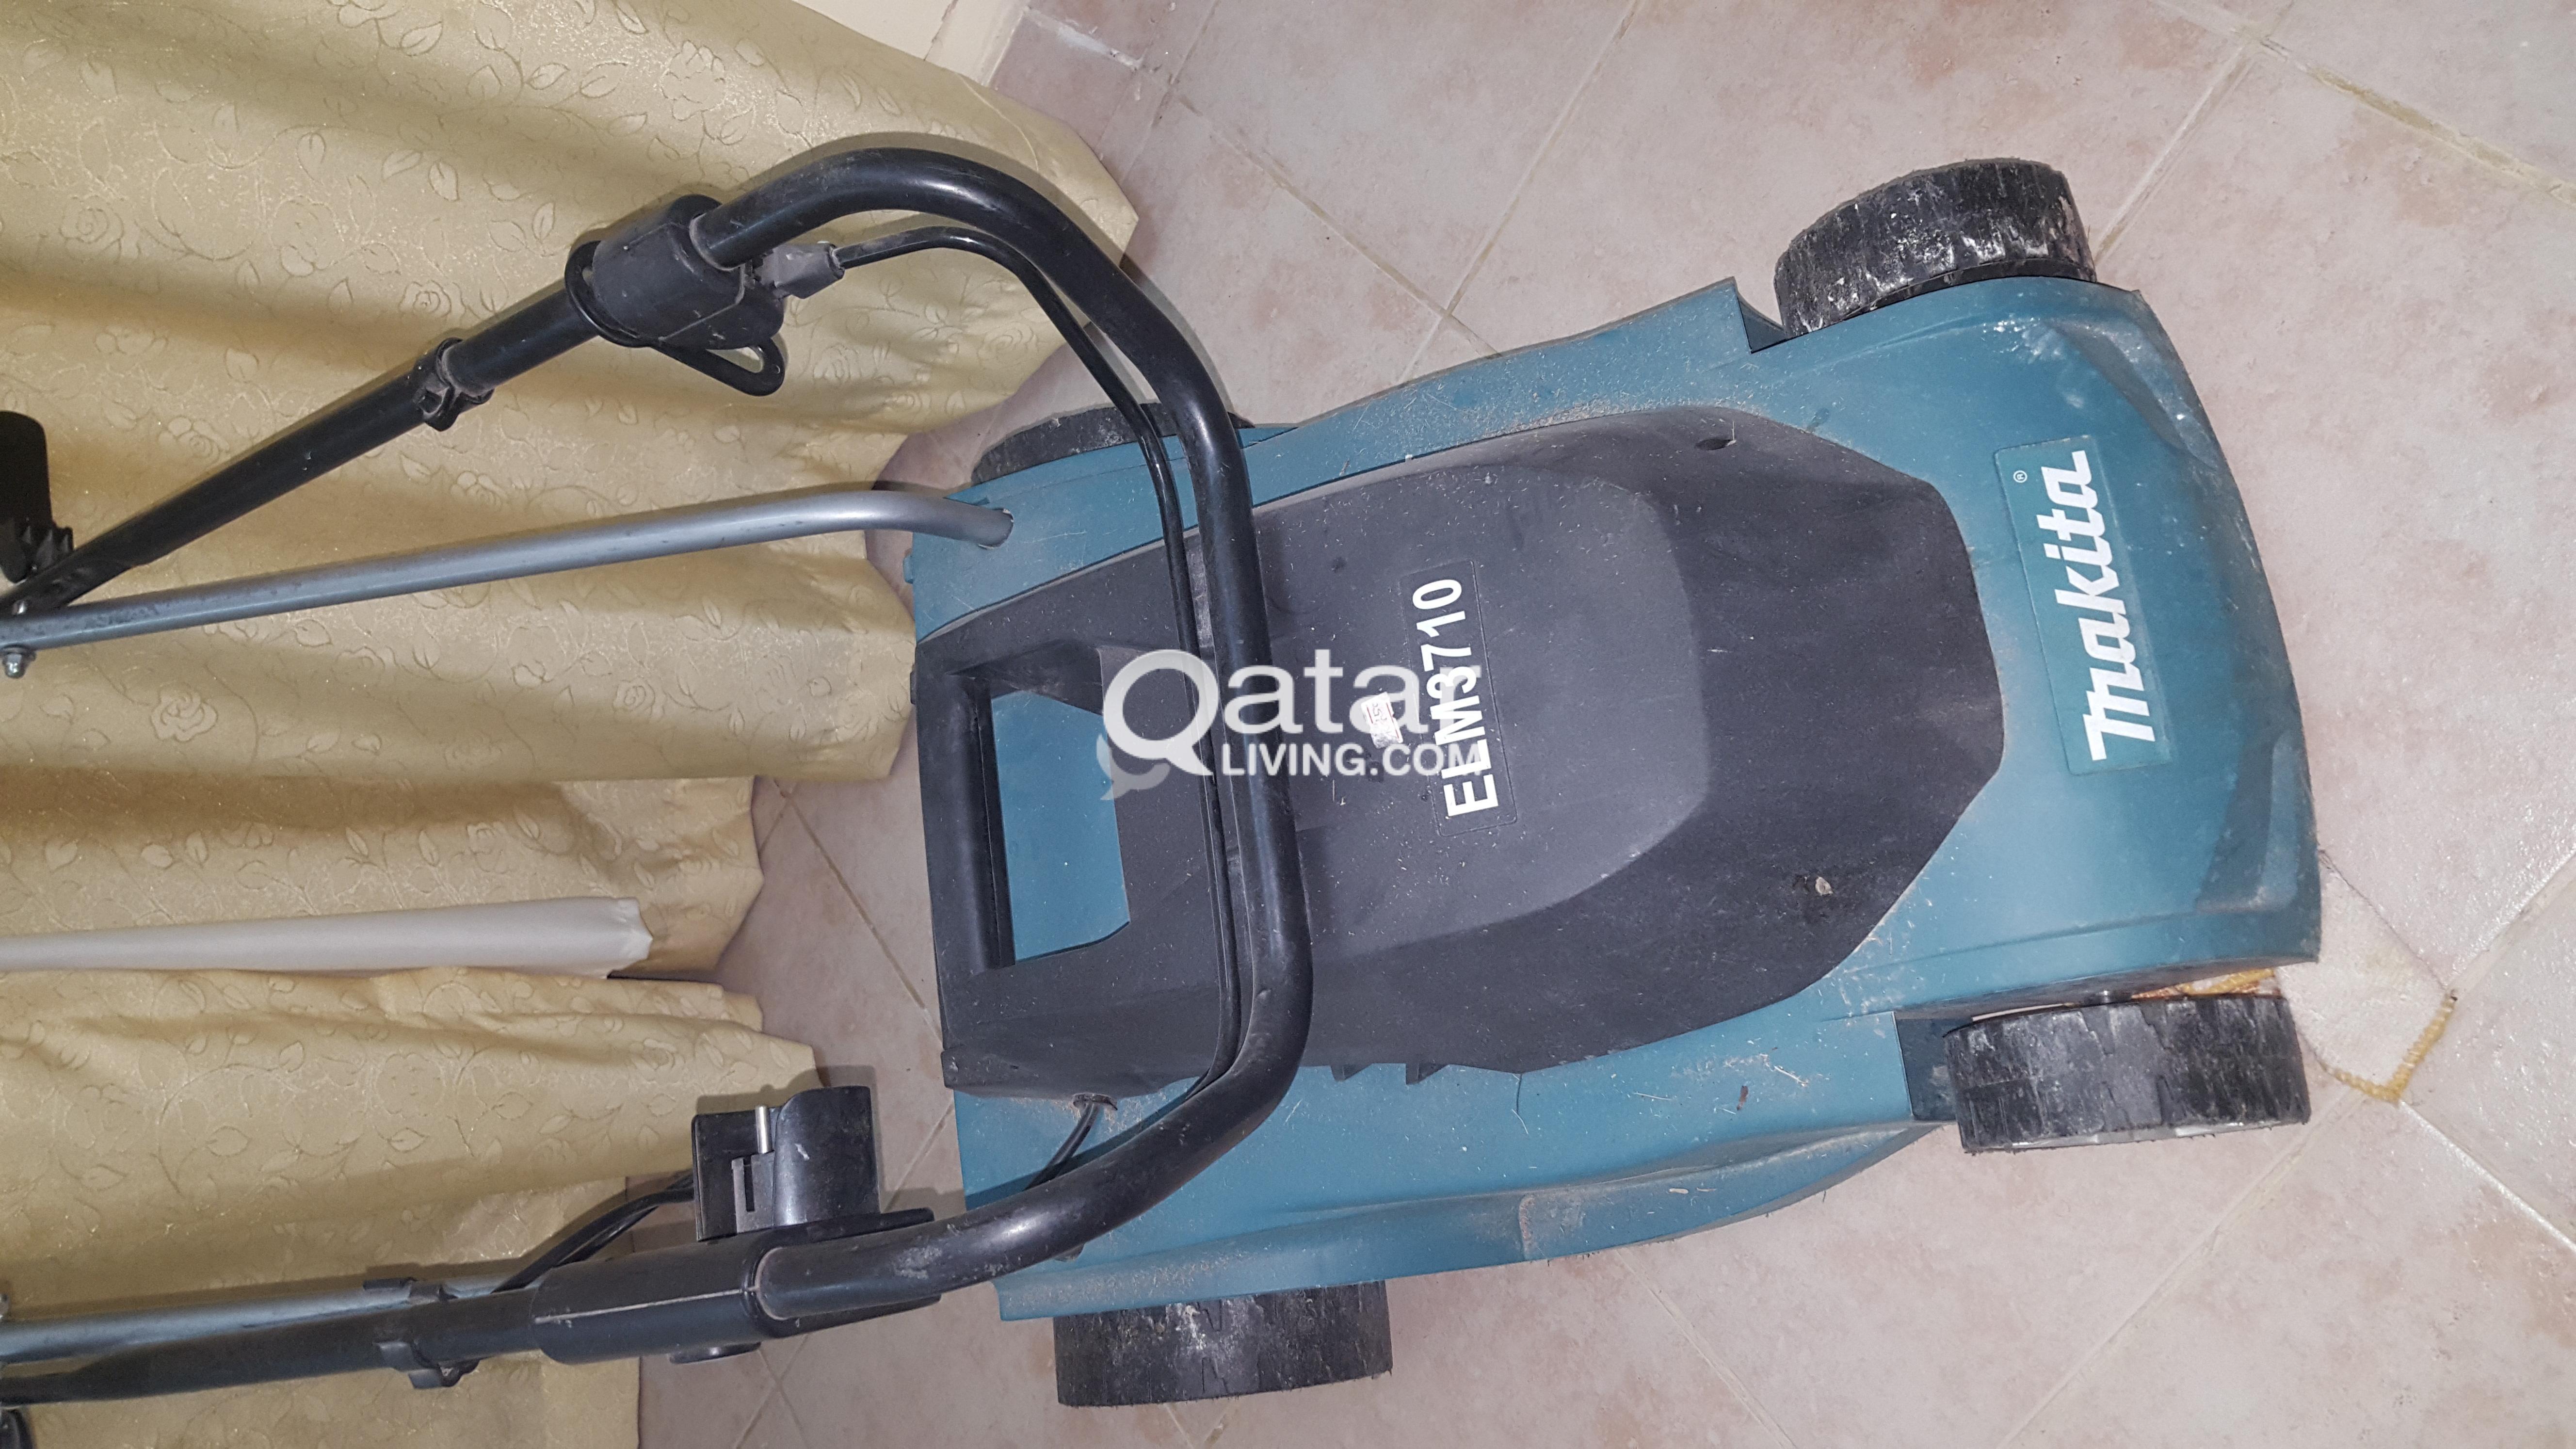 Grass Cutting Machine For Sale Qatar Living